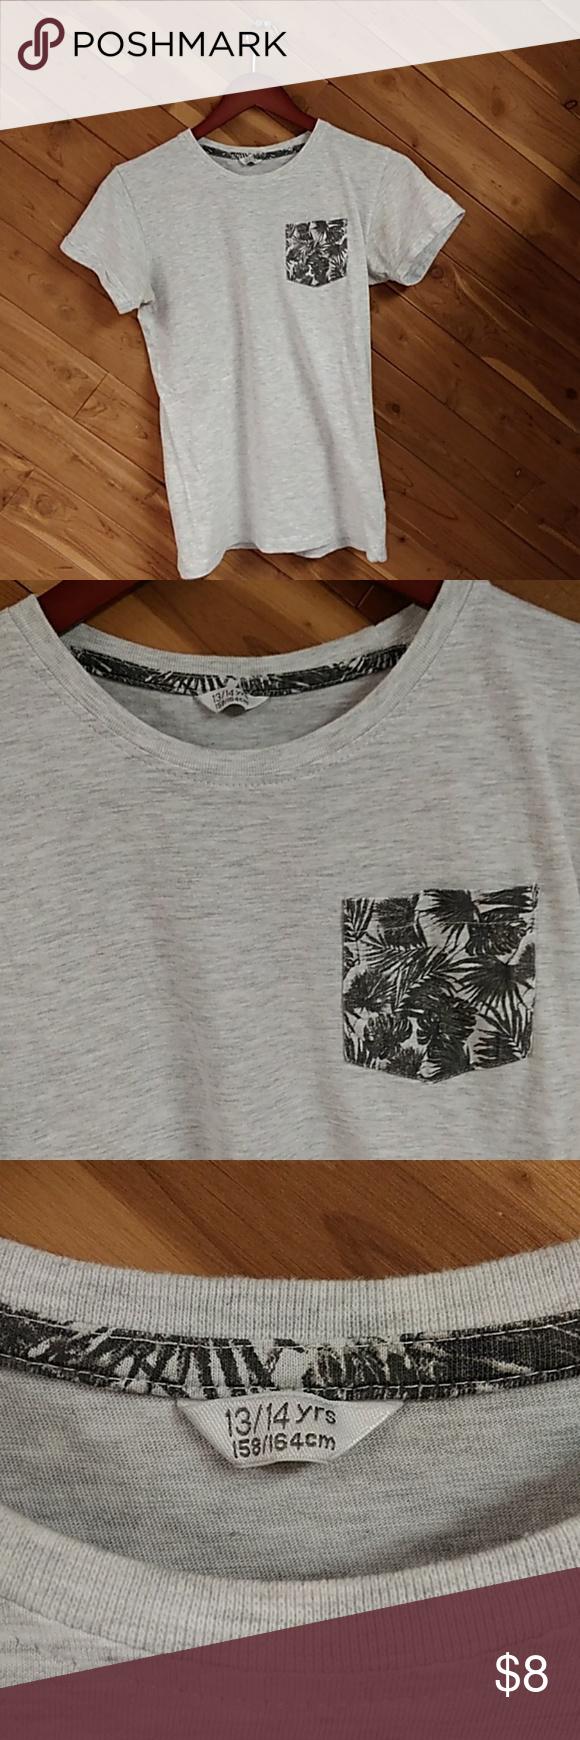 Shirt for years old boys my posh closet pinterest shirts